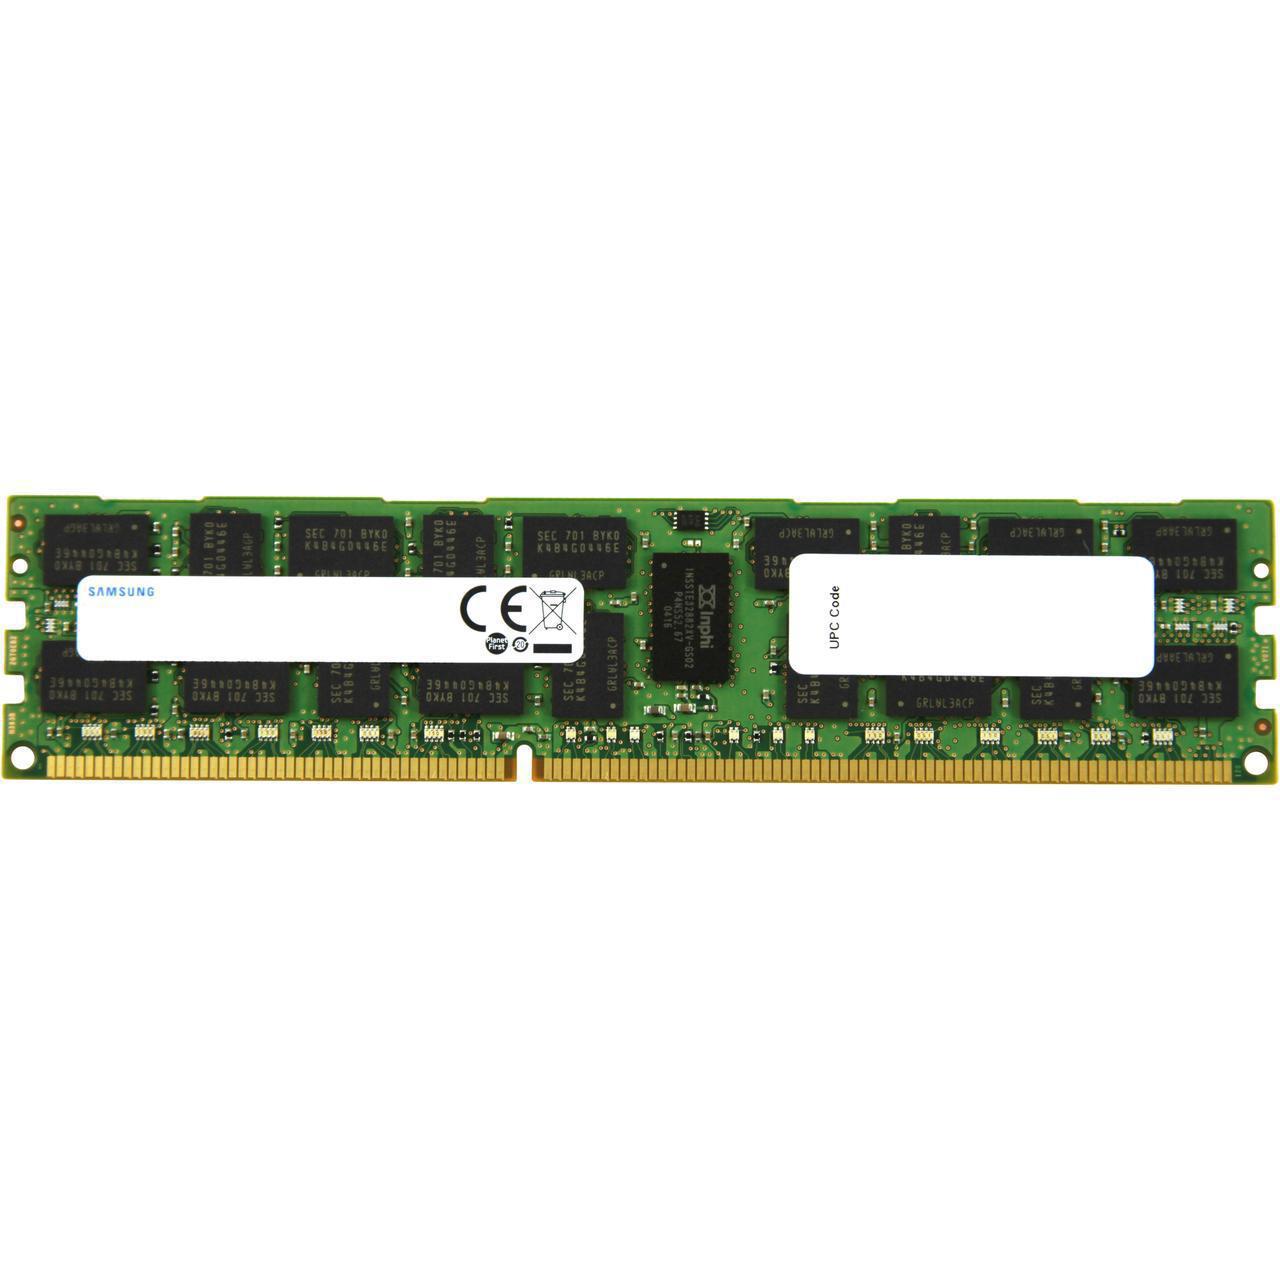 Samsung Server Memory Ddr3 16gb 240 Pin Rdimm Registered Ecc Pc3 12800r 1600 Cl11 12800 2rx4 135v Model M393b2g70eb0 Yk0